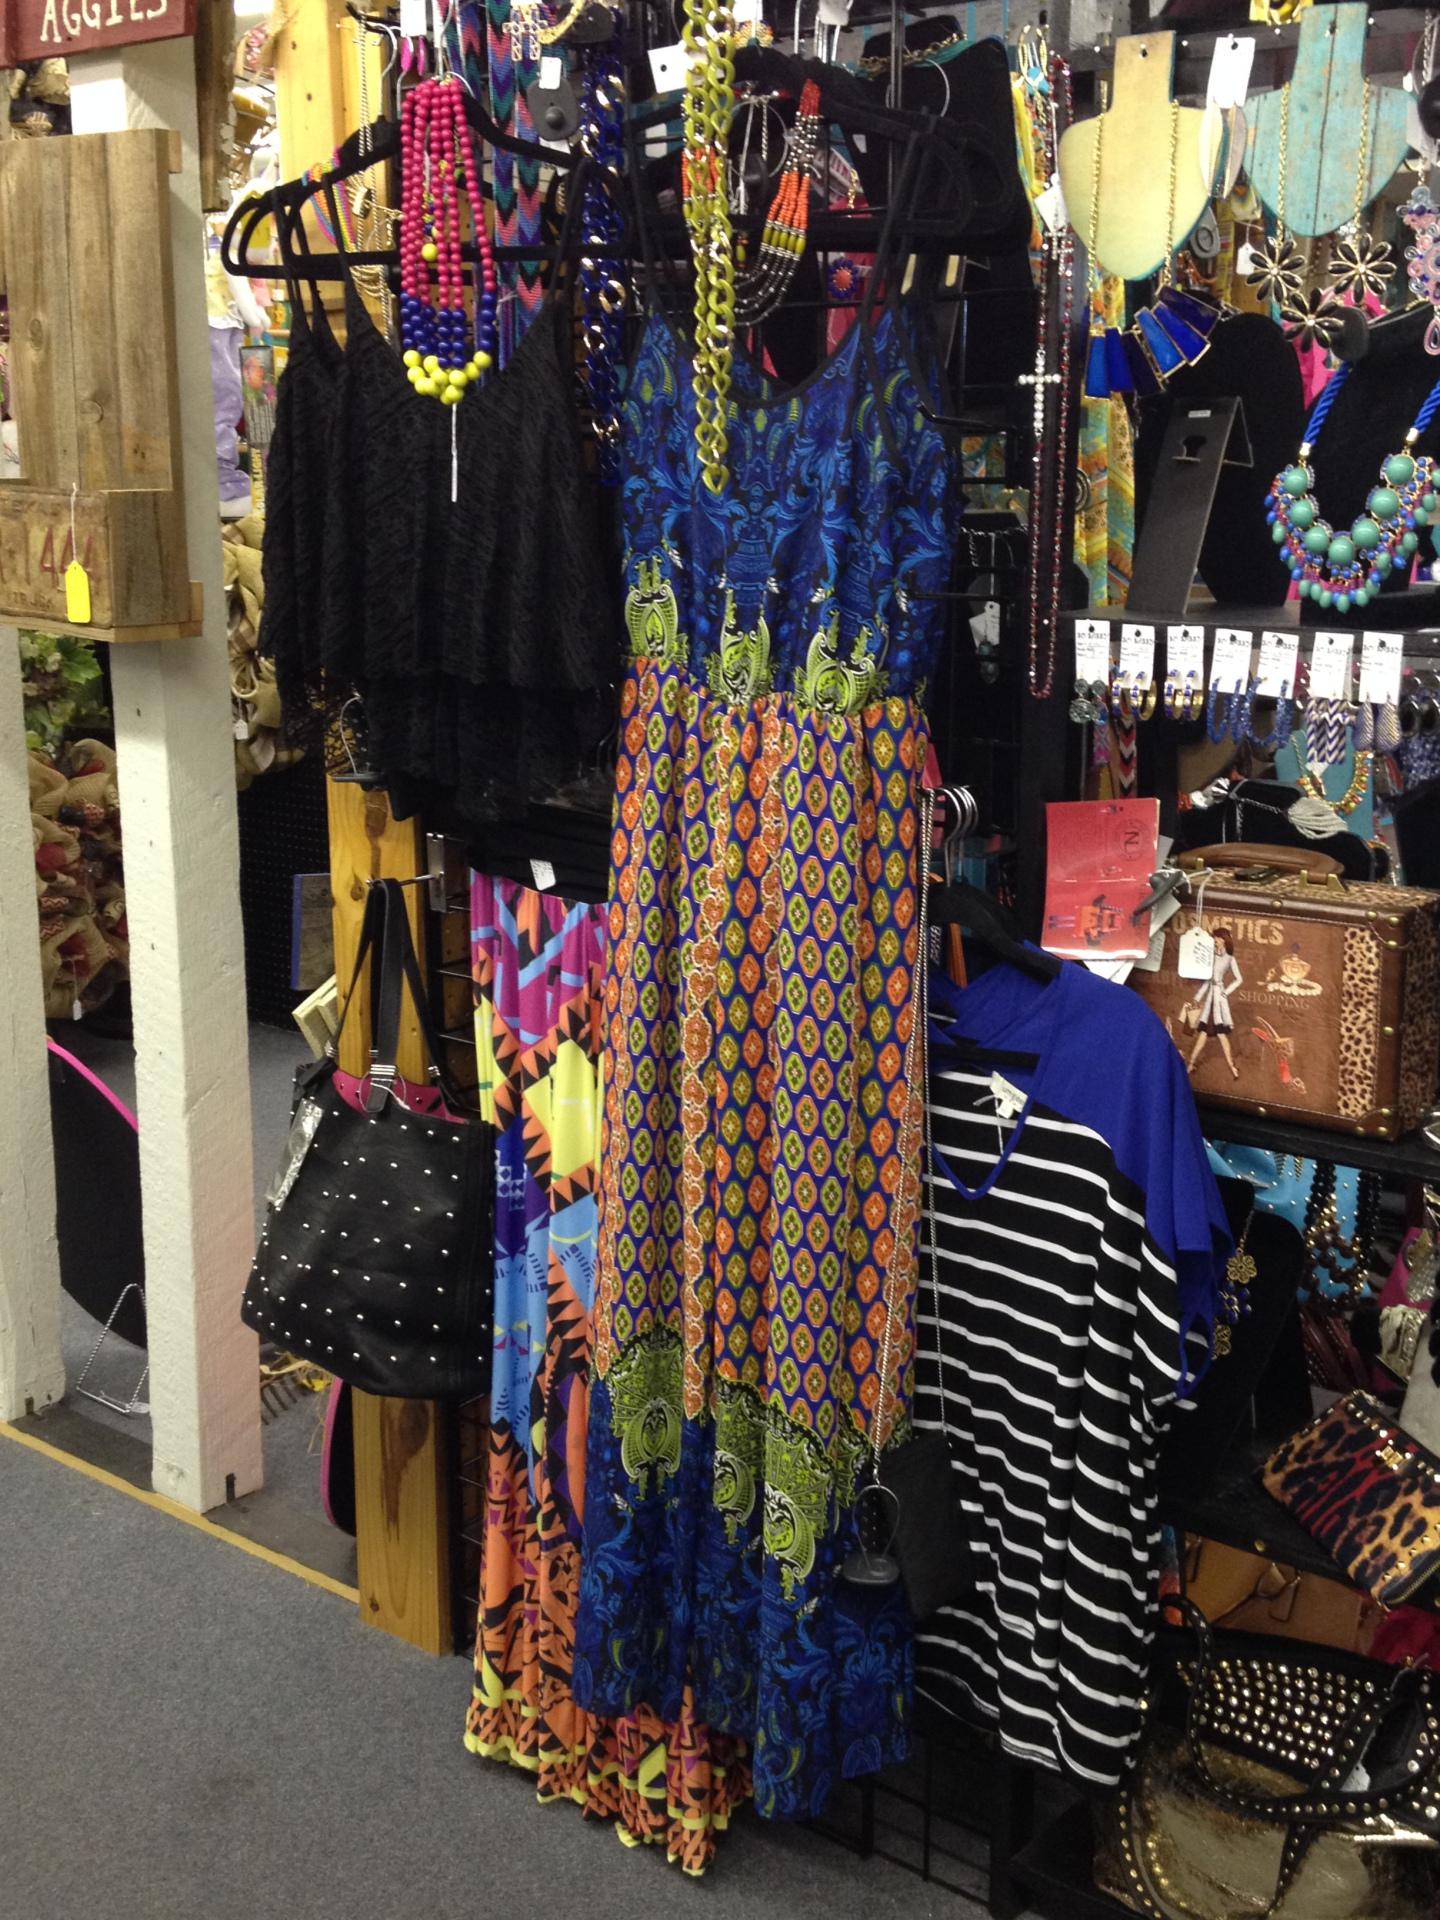 Dress Shop Waco